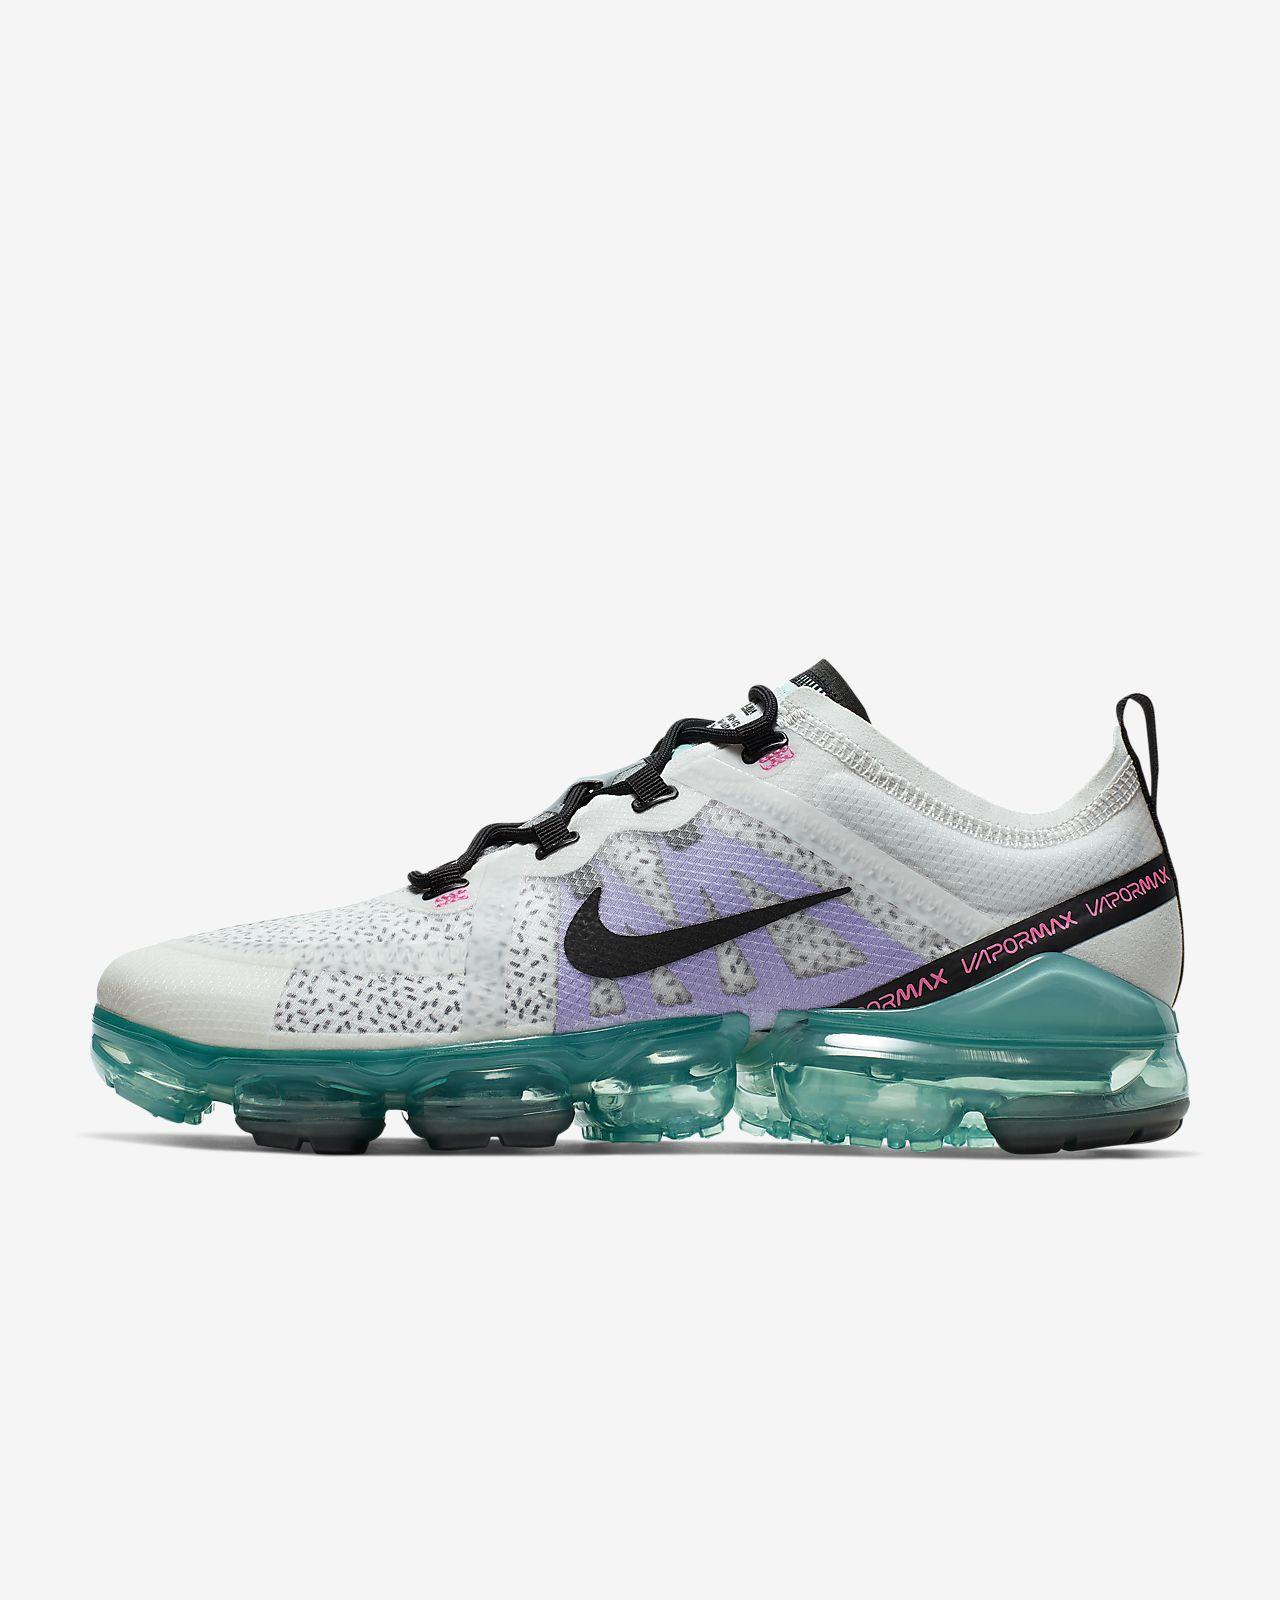 reputable site 812f0 34b41 Nike Air VaporMax 2019 Shoe